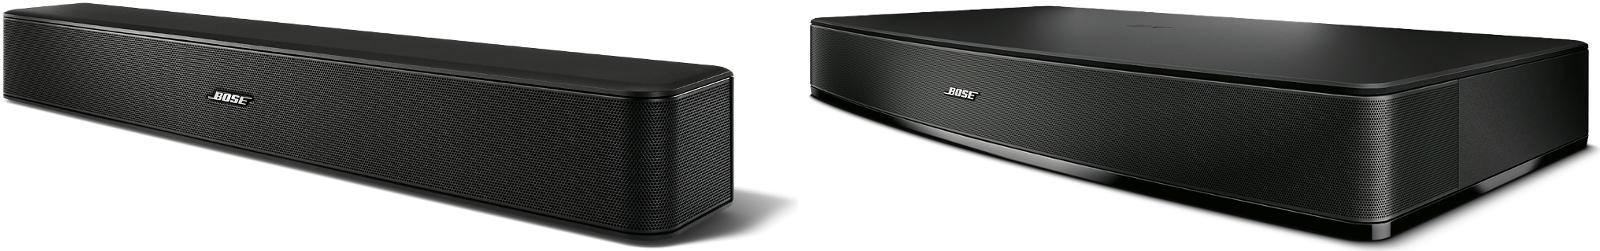 Barre de son Solo 5 et plateau sonore Solo 15 serie II de Bose !